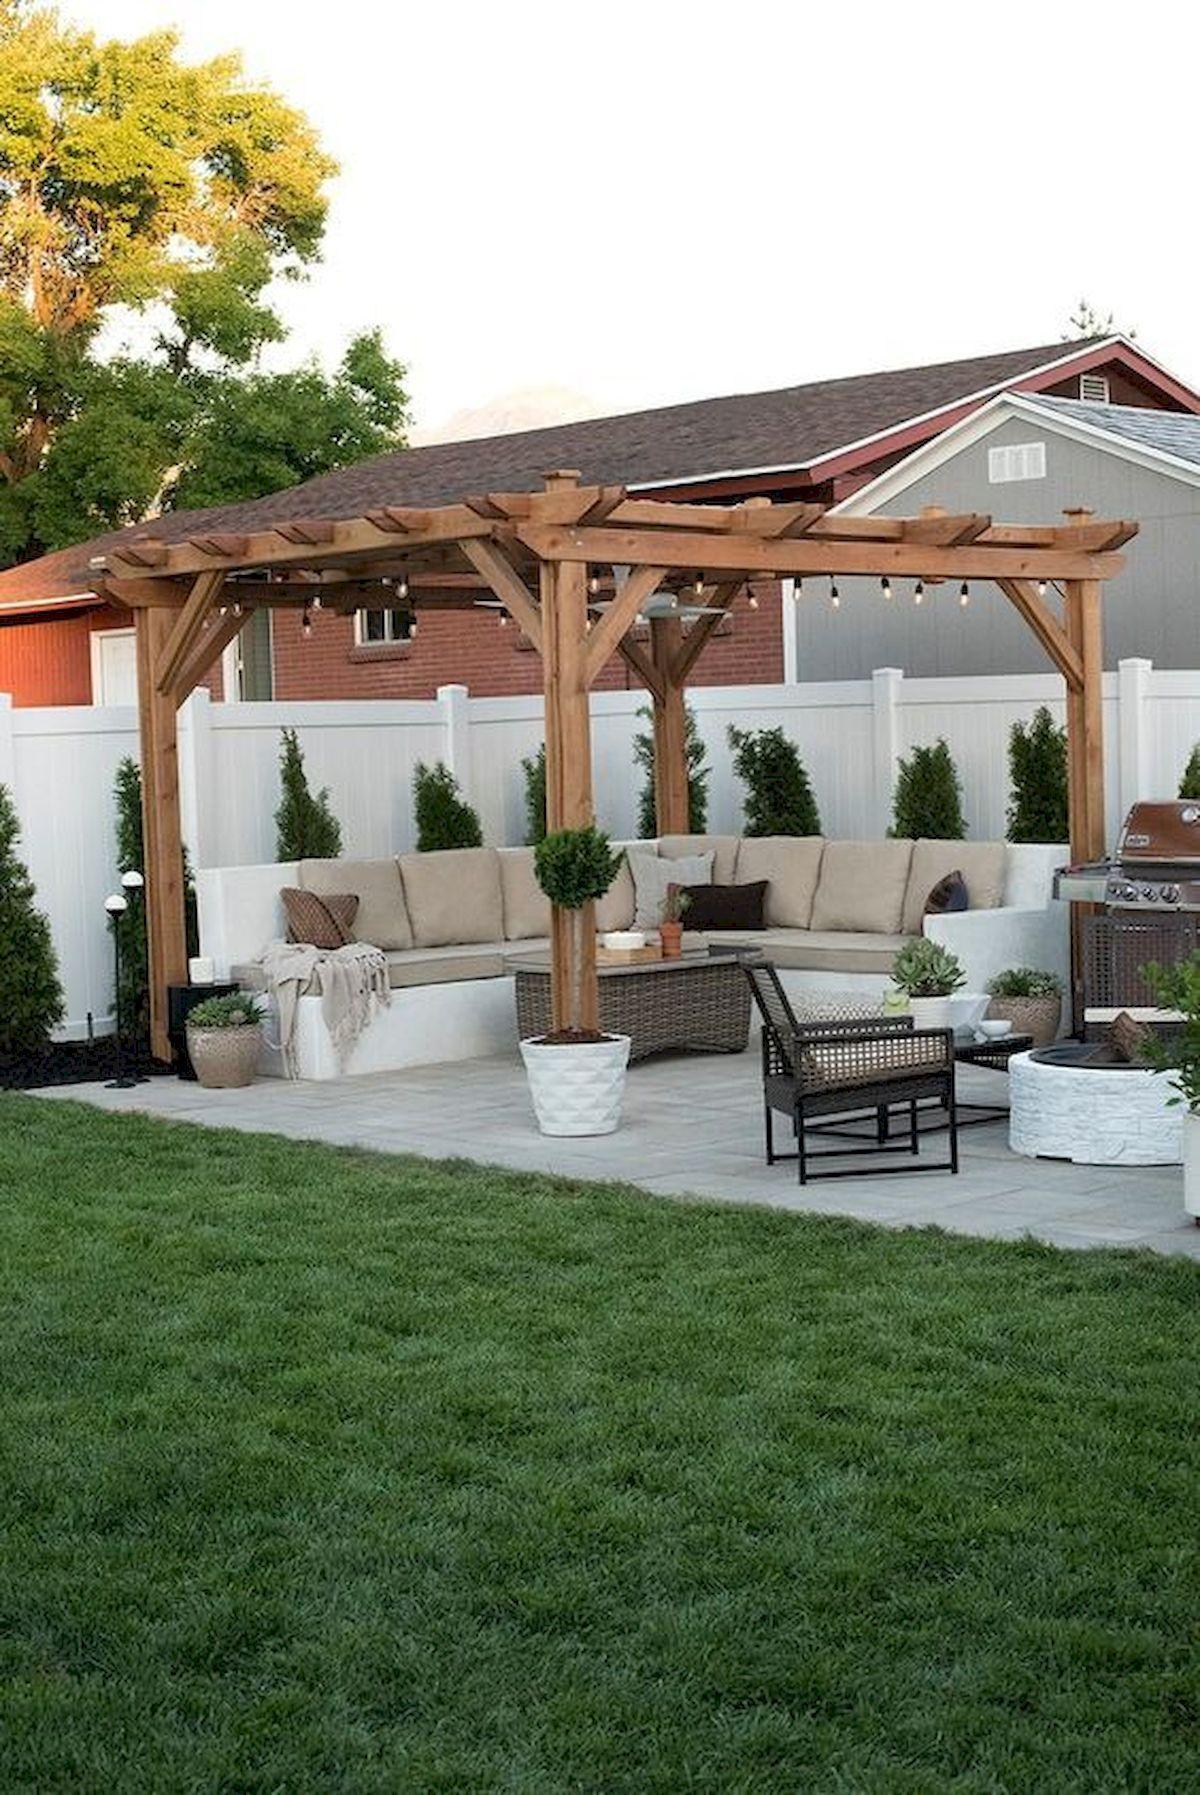 28 Best Farmhouse Backyard Decor Ideas Small Backyard Patio Backyard Landscaping Designs Backyard Seating